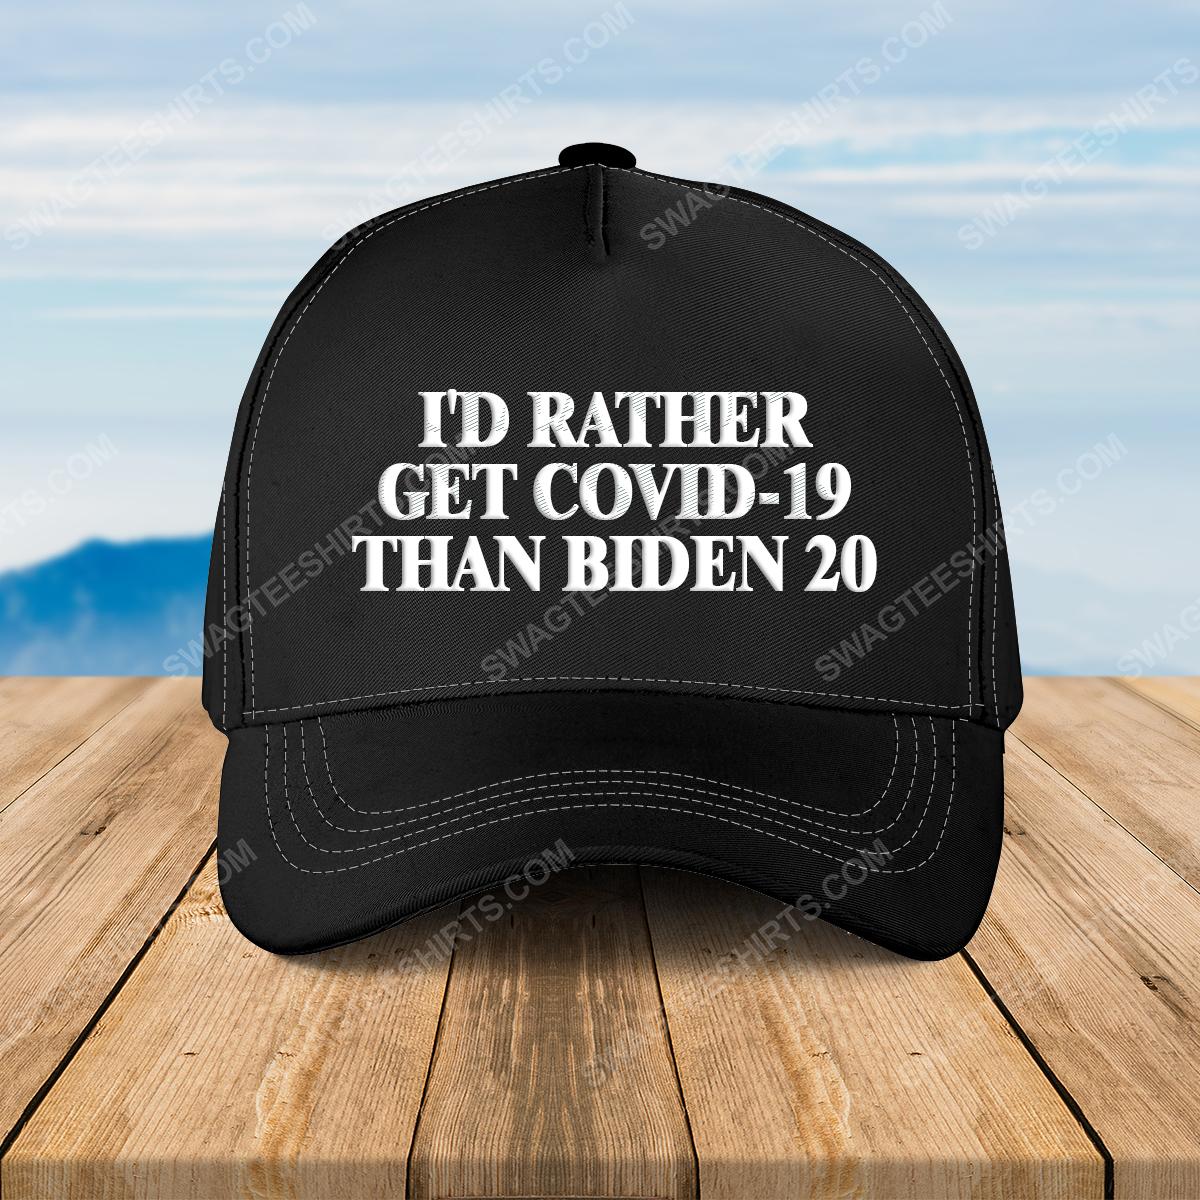 I'd rather get covid-19 than biden 20 full print classic hat 1